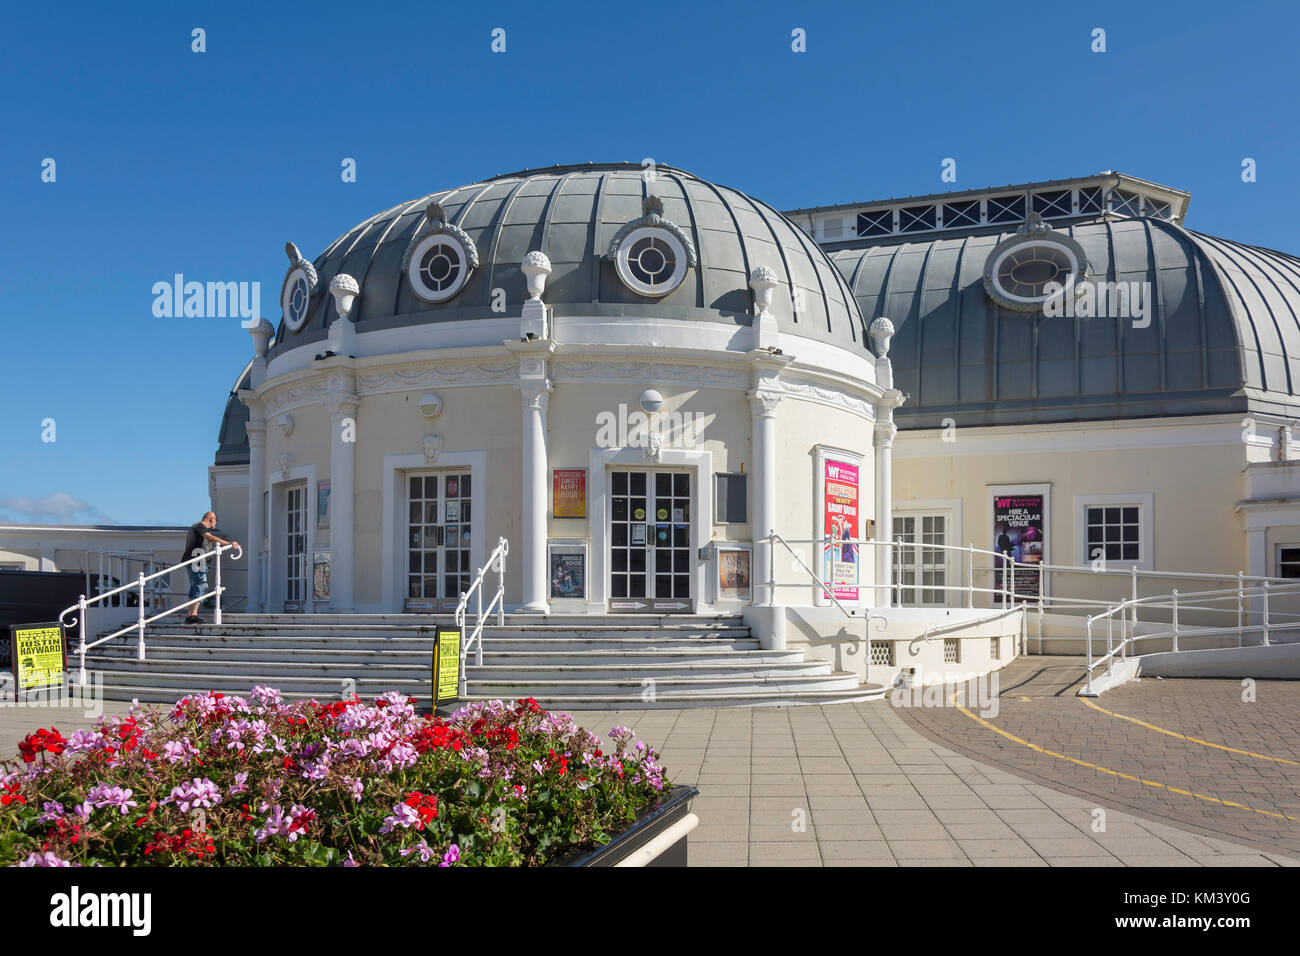 Regal Pavilion Theatre, Marine Parade, Worthing, West Sussex, England, United Kingdom - Stock Image